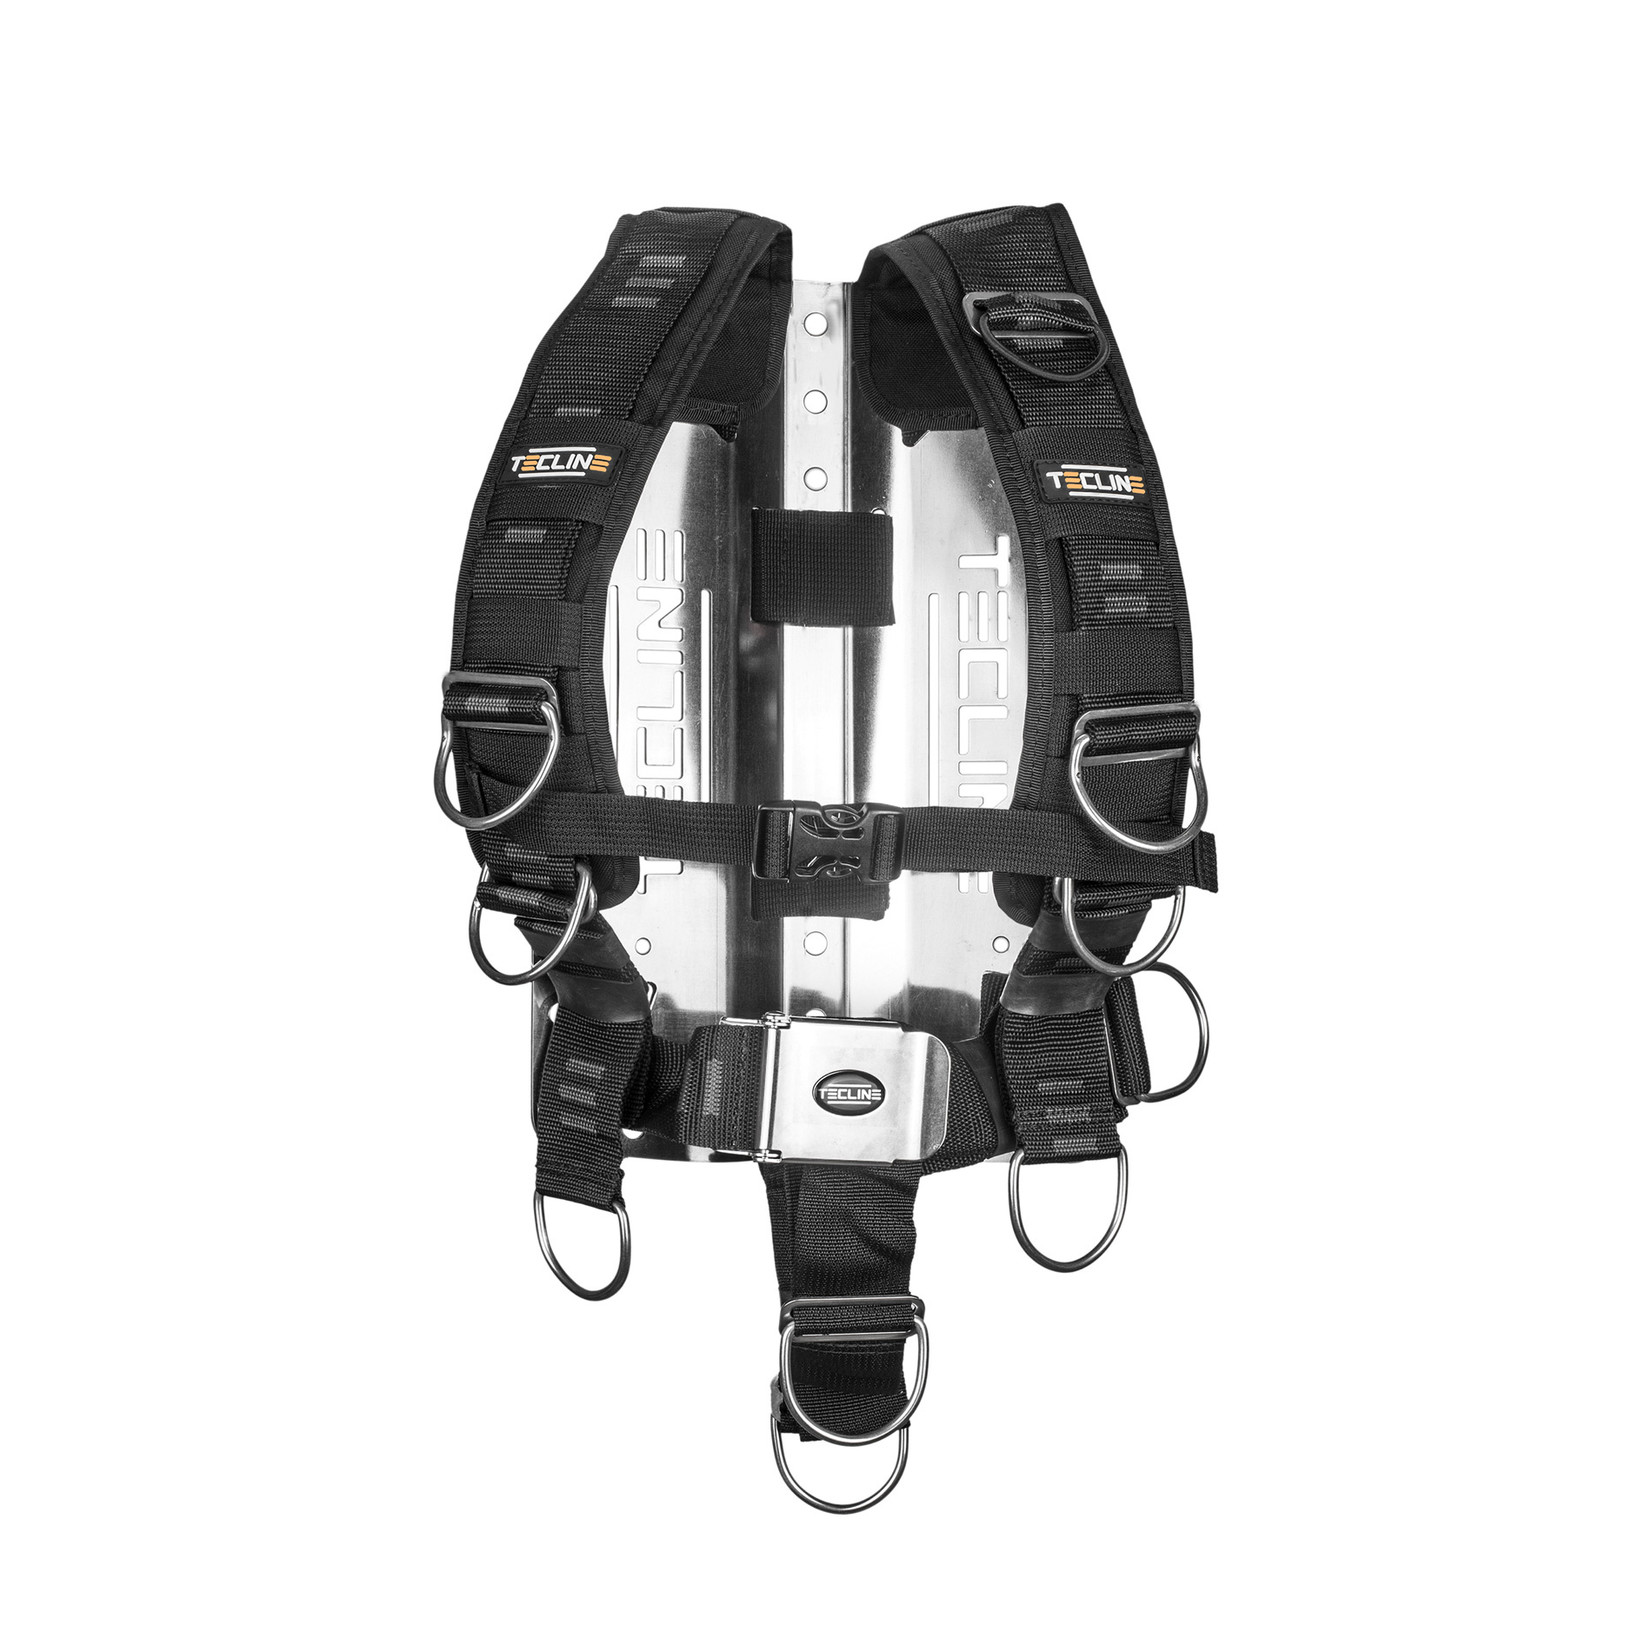 Tecline Harness TecLine Comfort (adjustable) standard webbing -  incl. 3mm RVS backplate